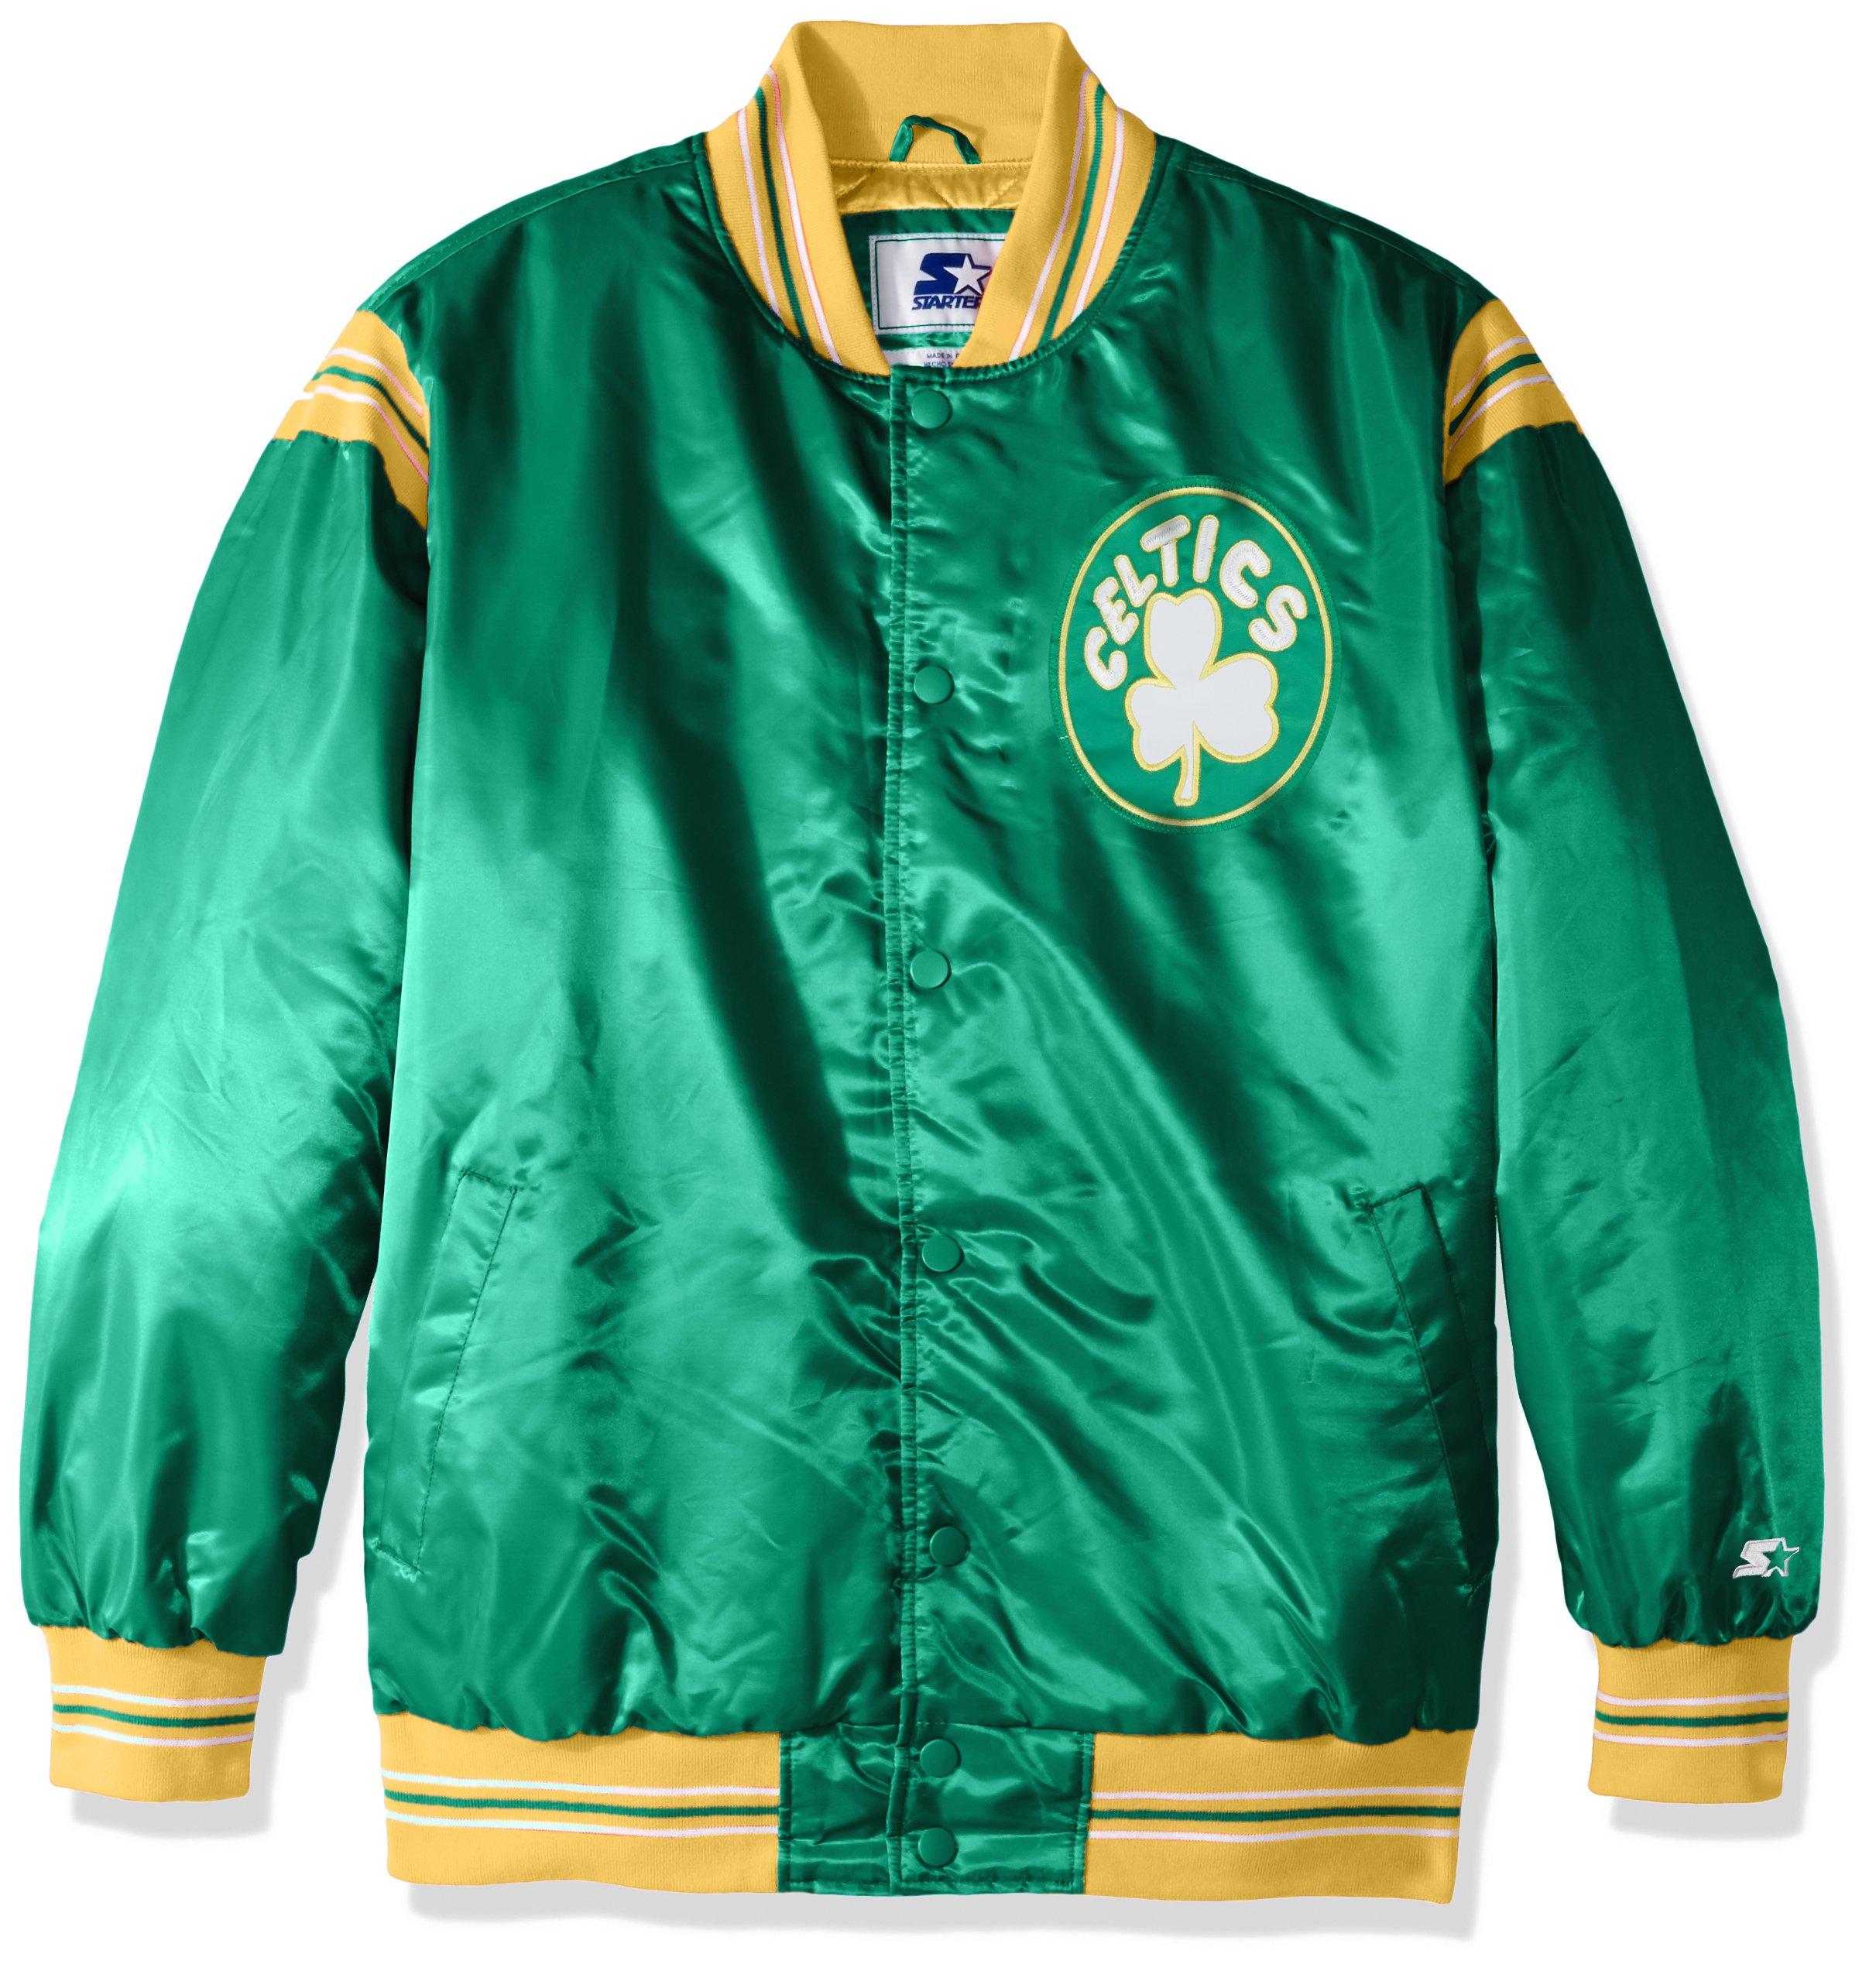 STARTER NBA Men s The Enforcer Retro Satin Jacket - Boston Fanz bbcc8baa5